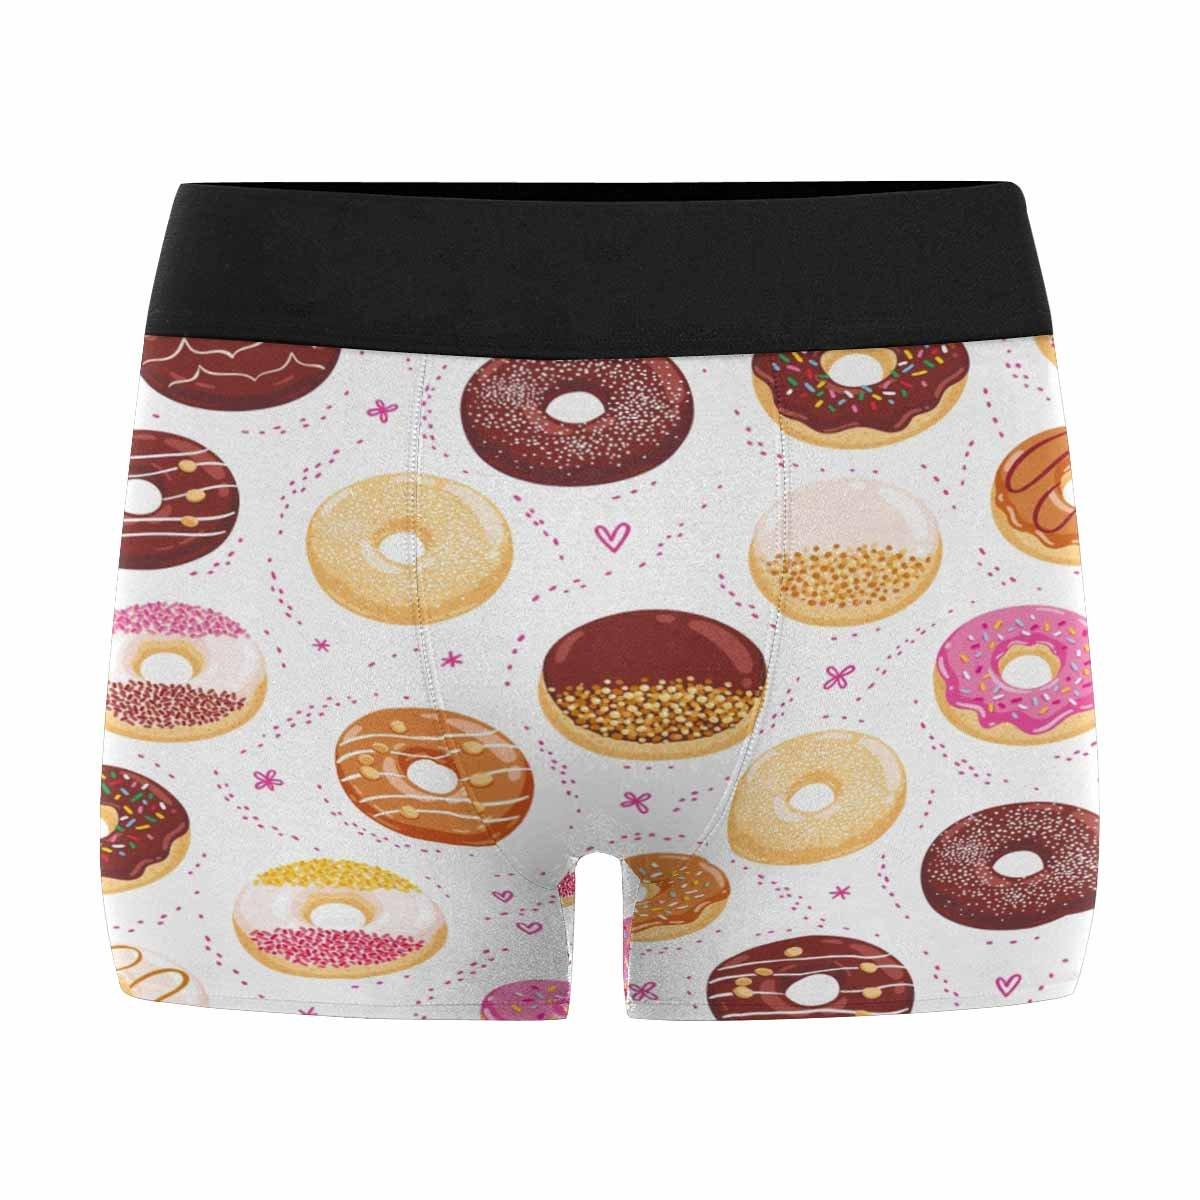 XS-3XL INTERESTPRINT Boxer Briefs Mens Underwear Donuts and Little Hearts